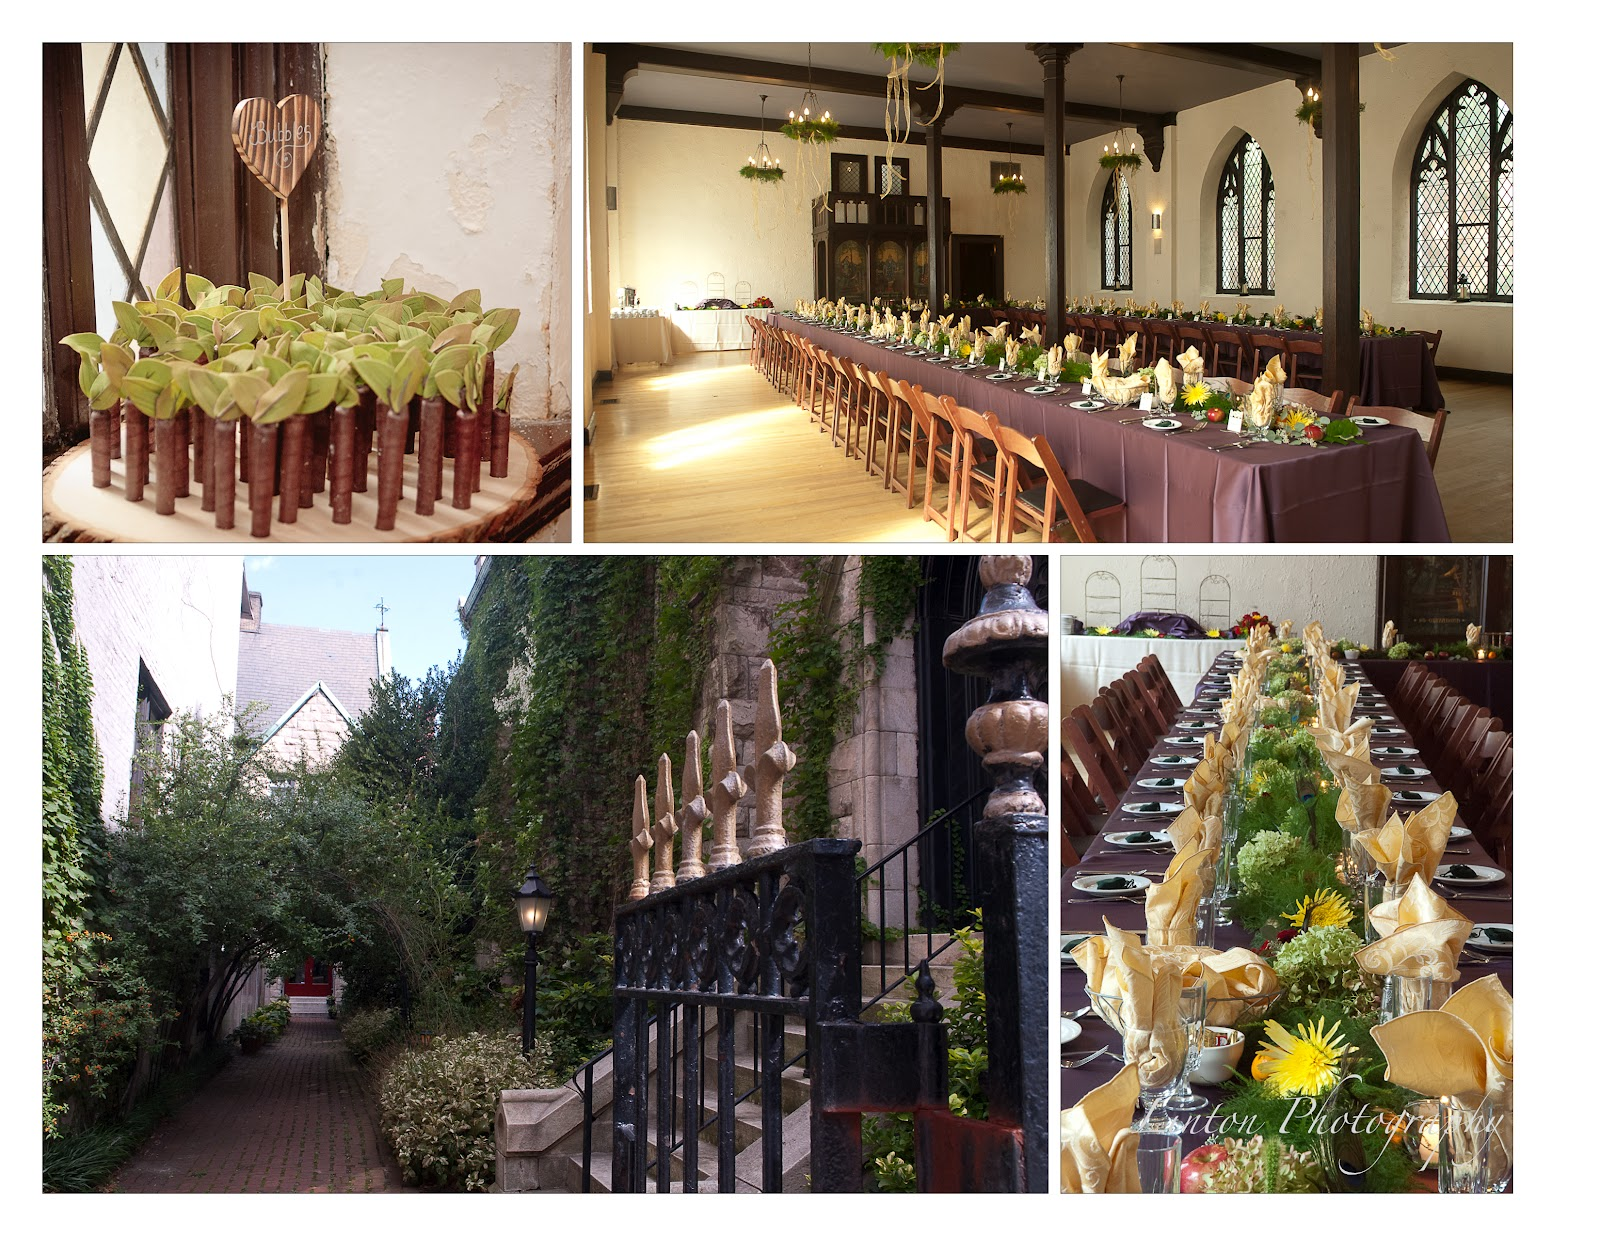 Medieval Wedding Reception Gallery Wedding Theme Decoration Ideas